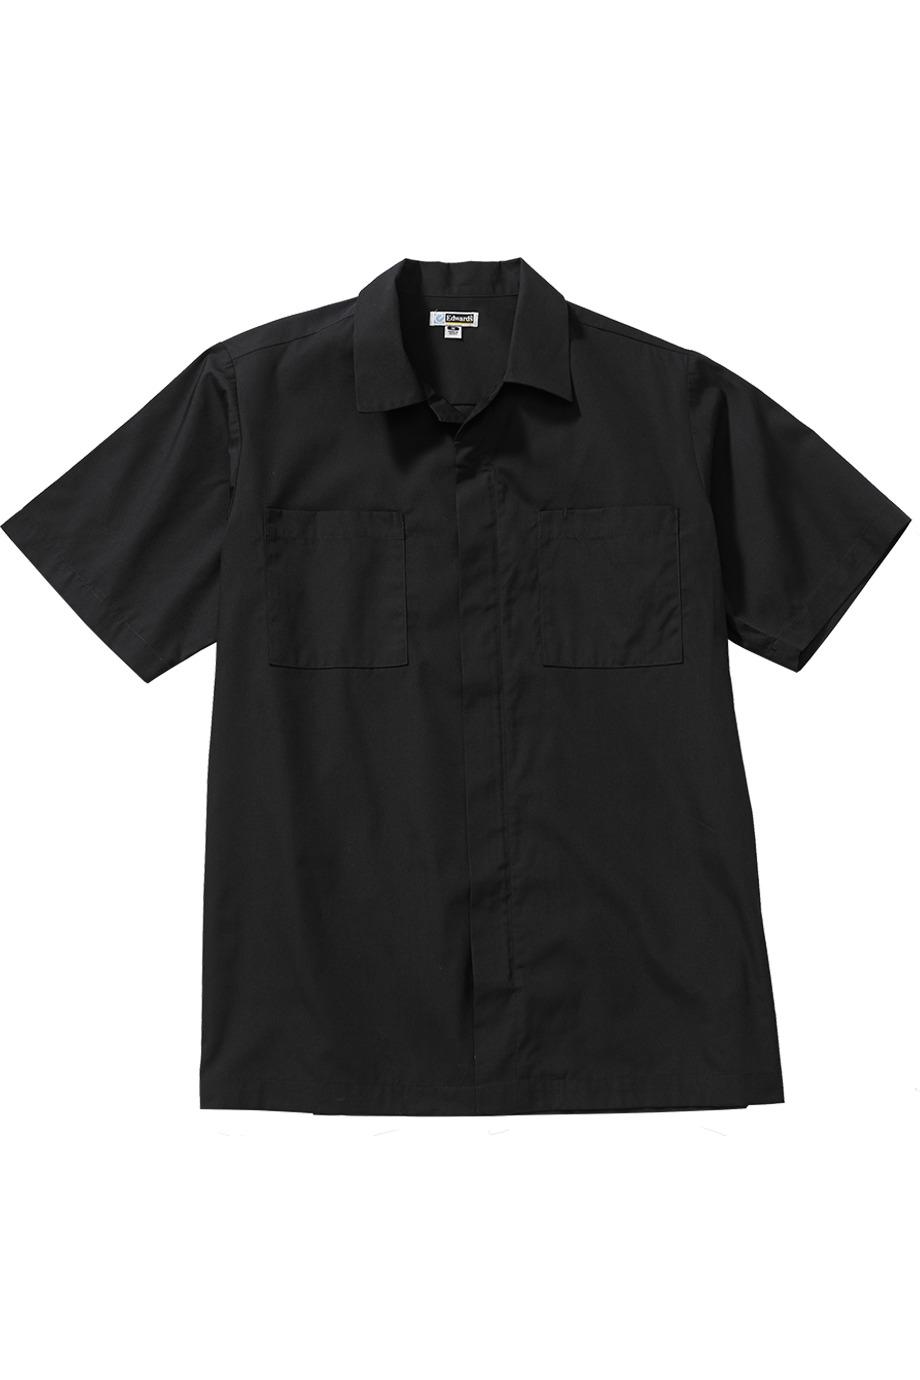 Edwards Garment 4889 - Housekeeping Service Shirt